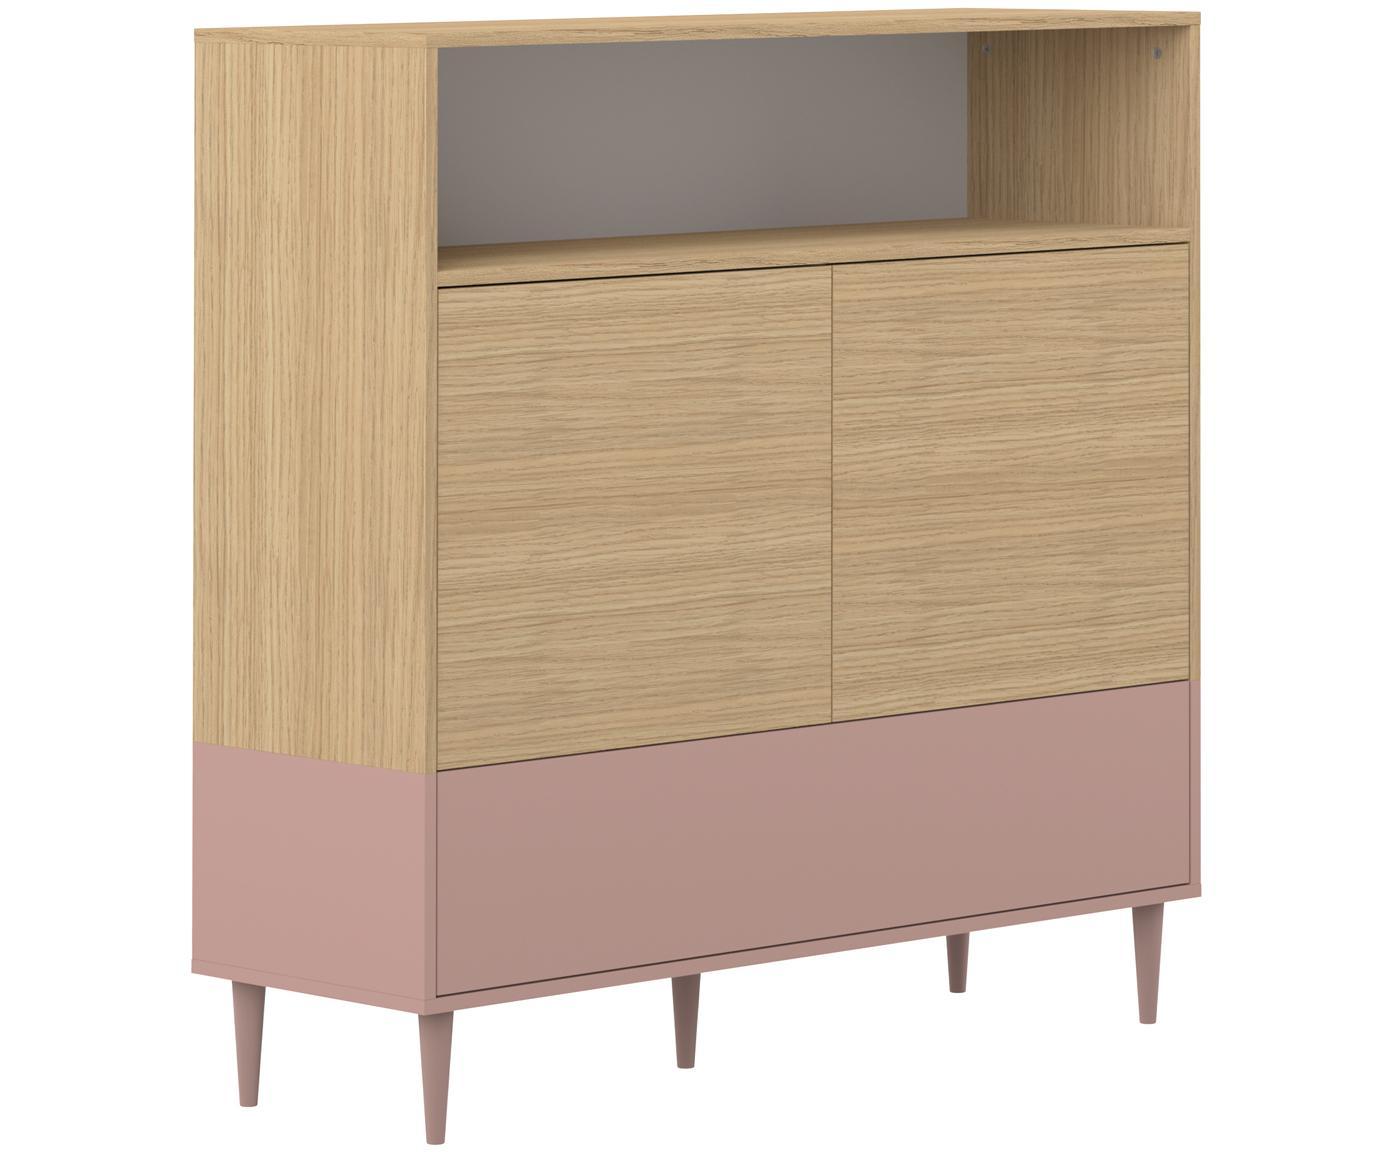 Highboard Horizon im Skandi Design, Korpus: Spanplatte, melaminbeschi, Eichenholz, Altrosa, 120 x 121 cm